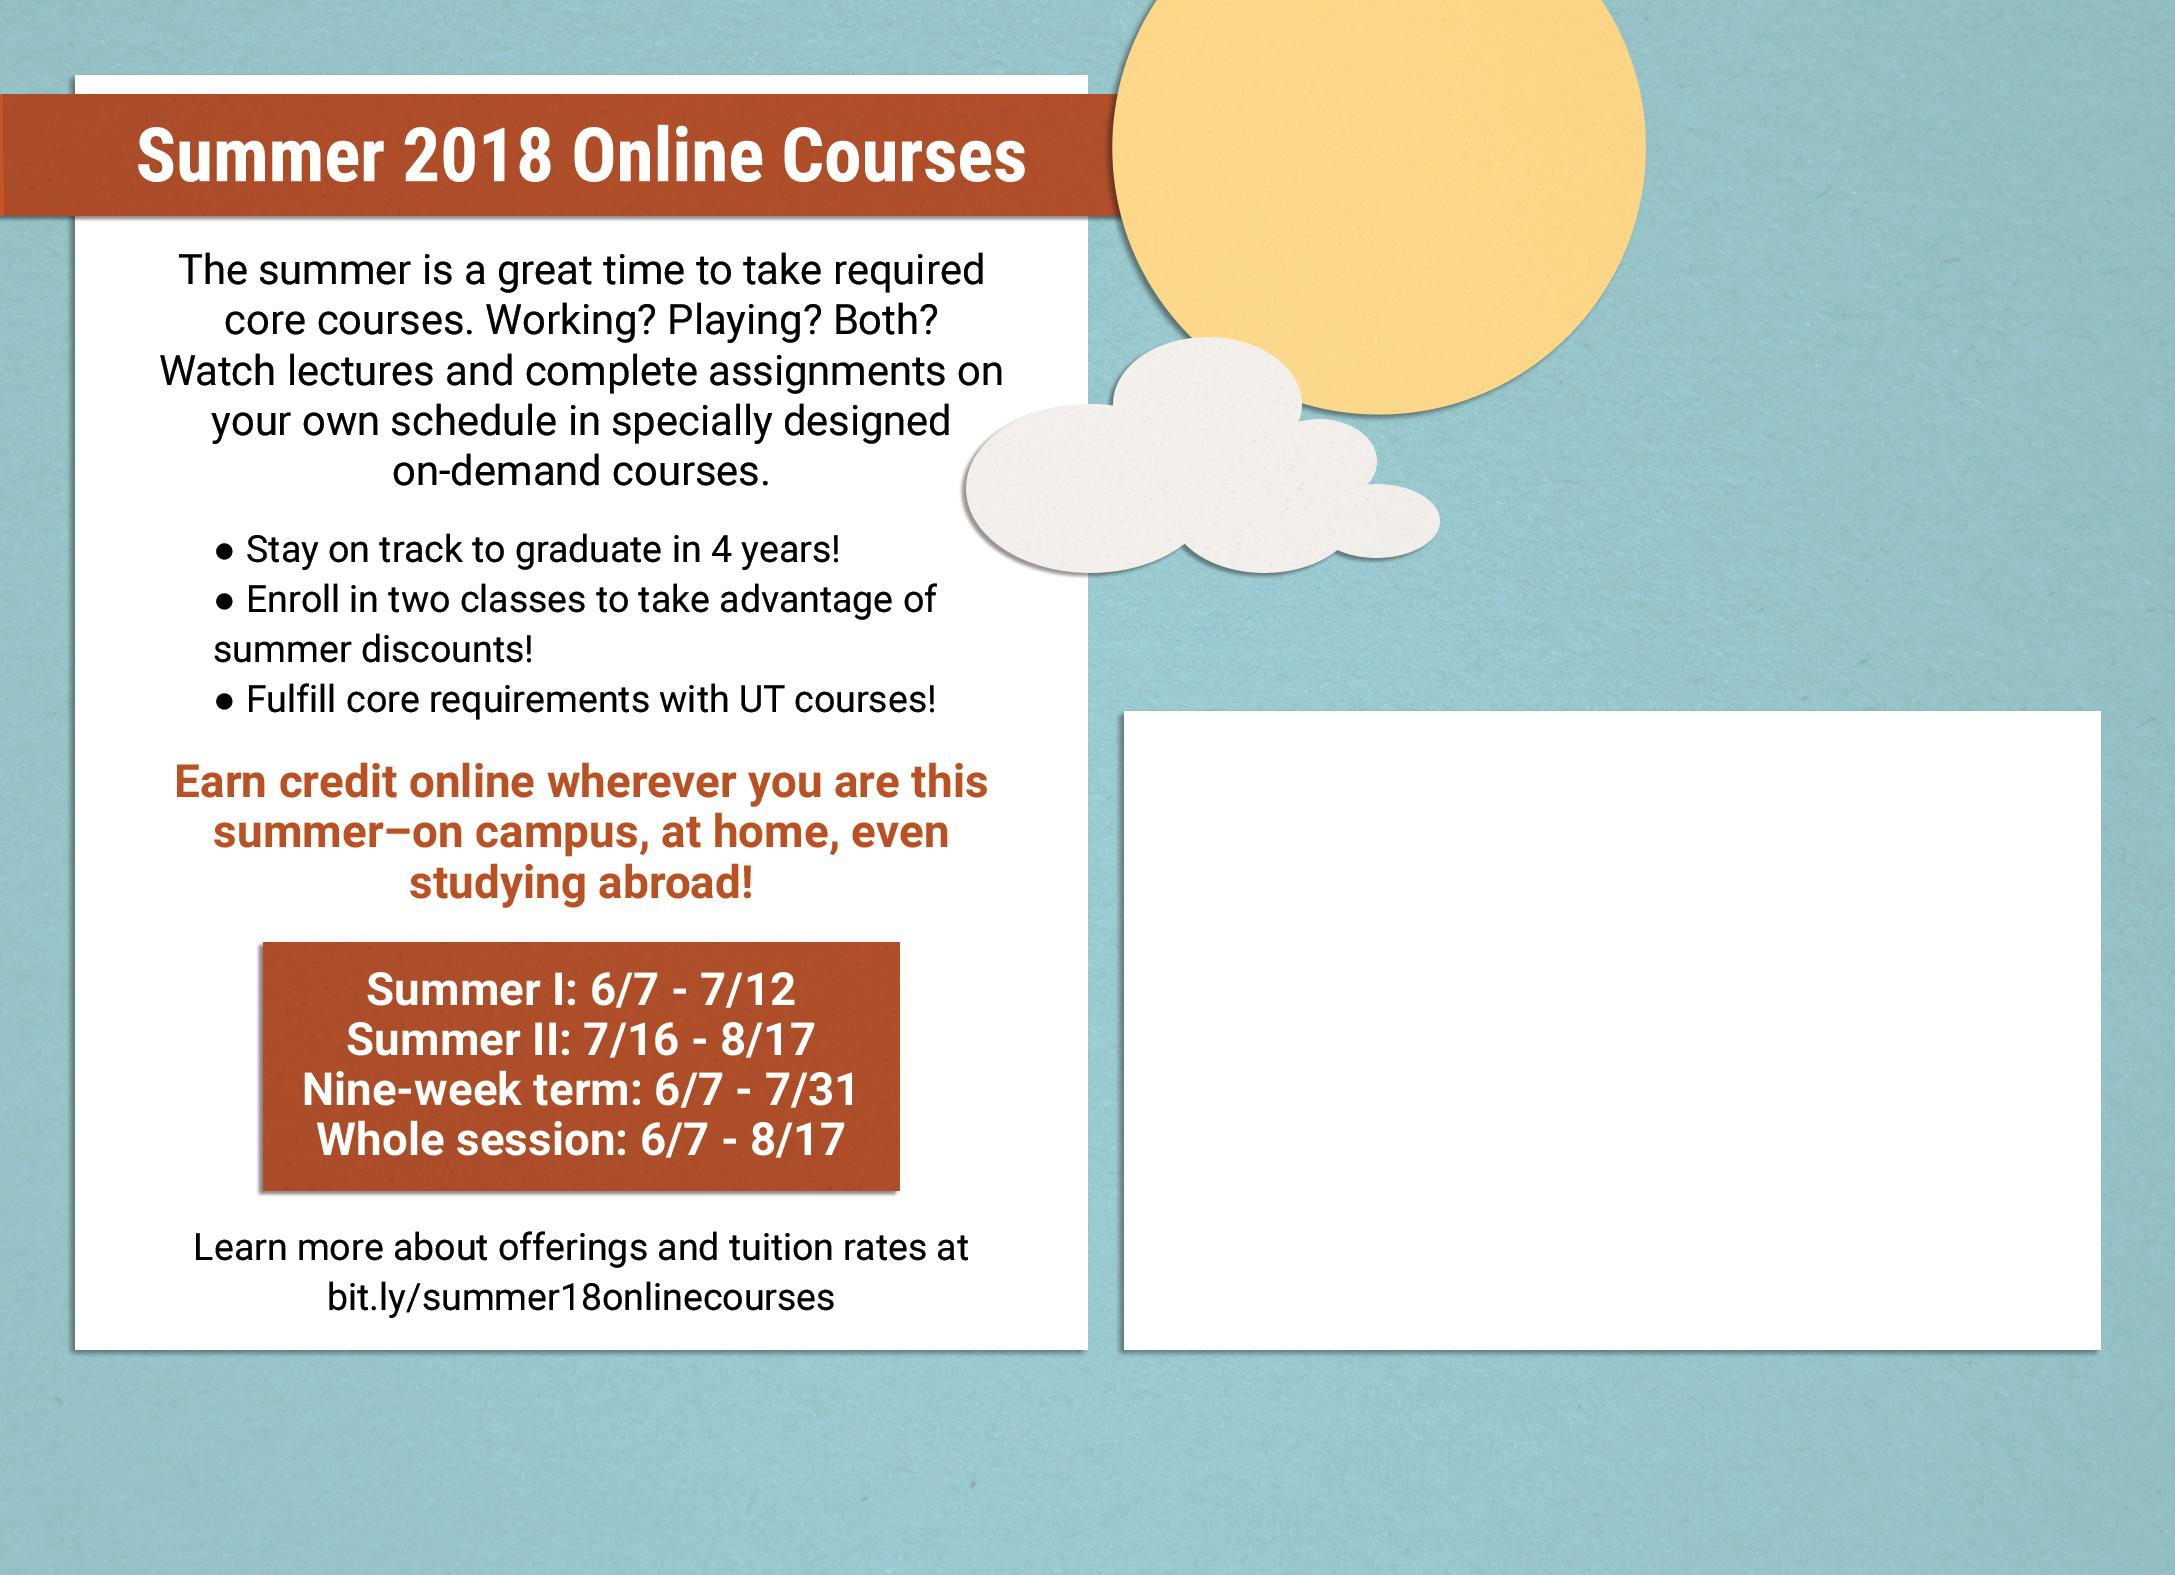 Summer Online Courses Postcard